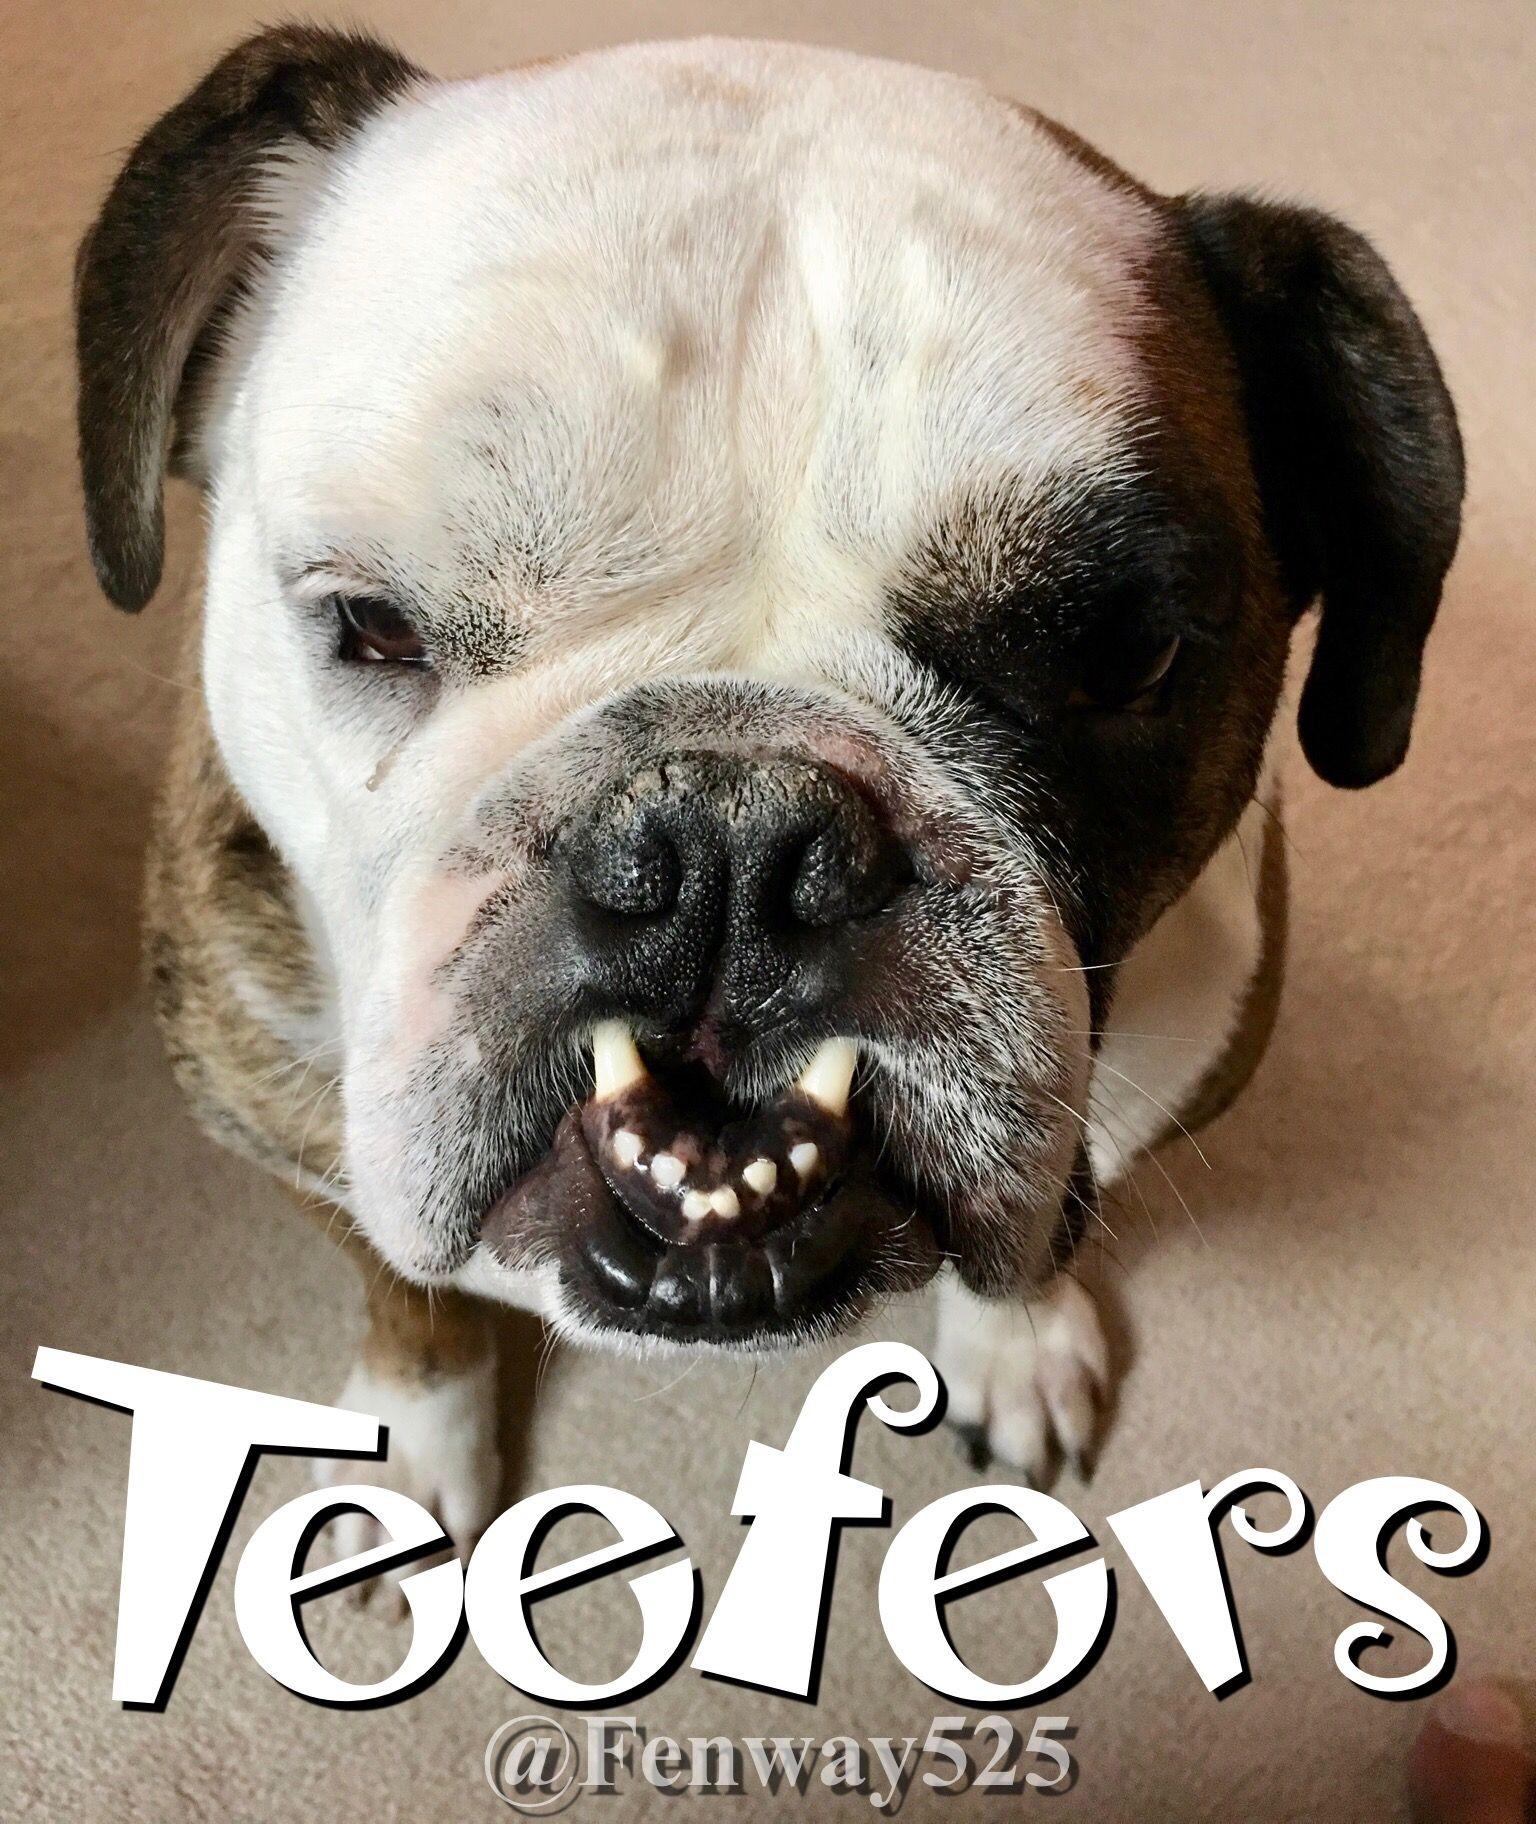 31Aug17 Fenway Bulldogs Teeth Orthodontics Bulldog